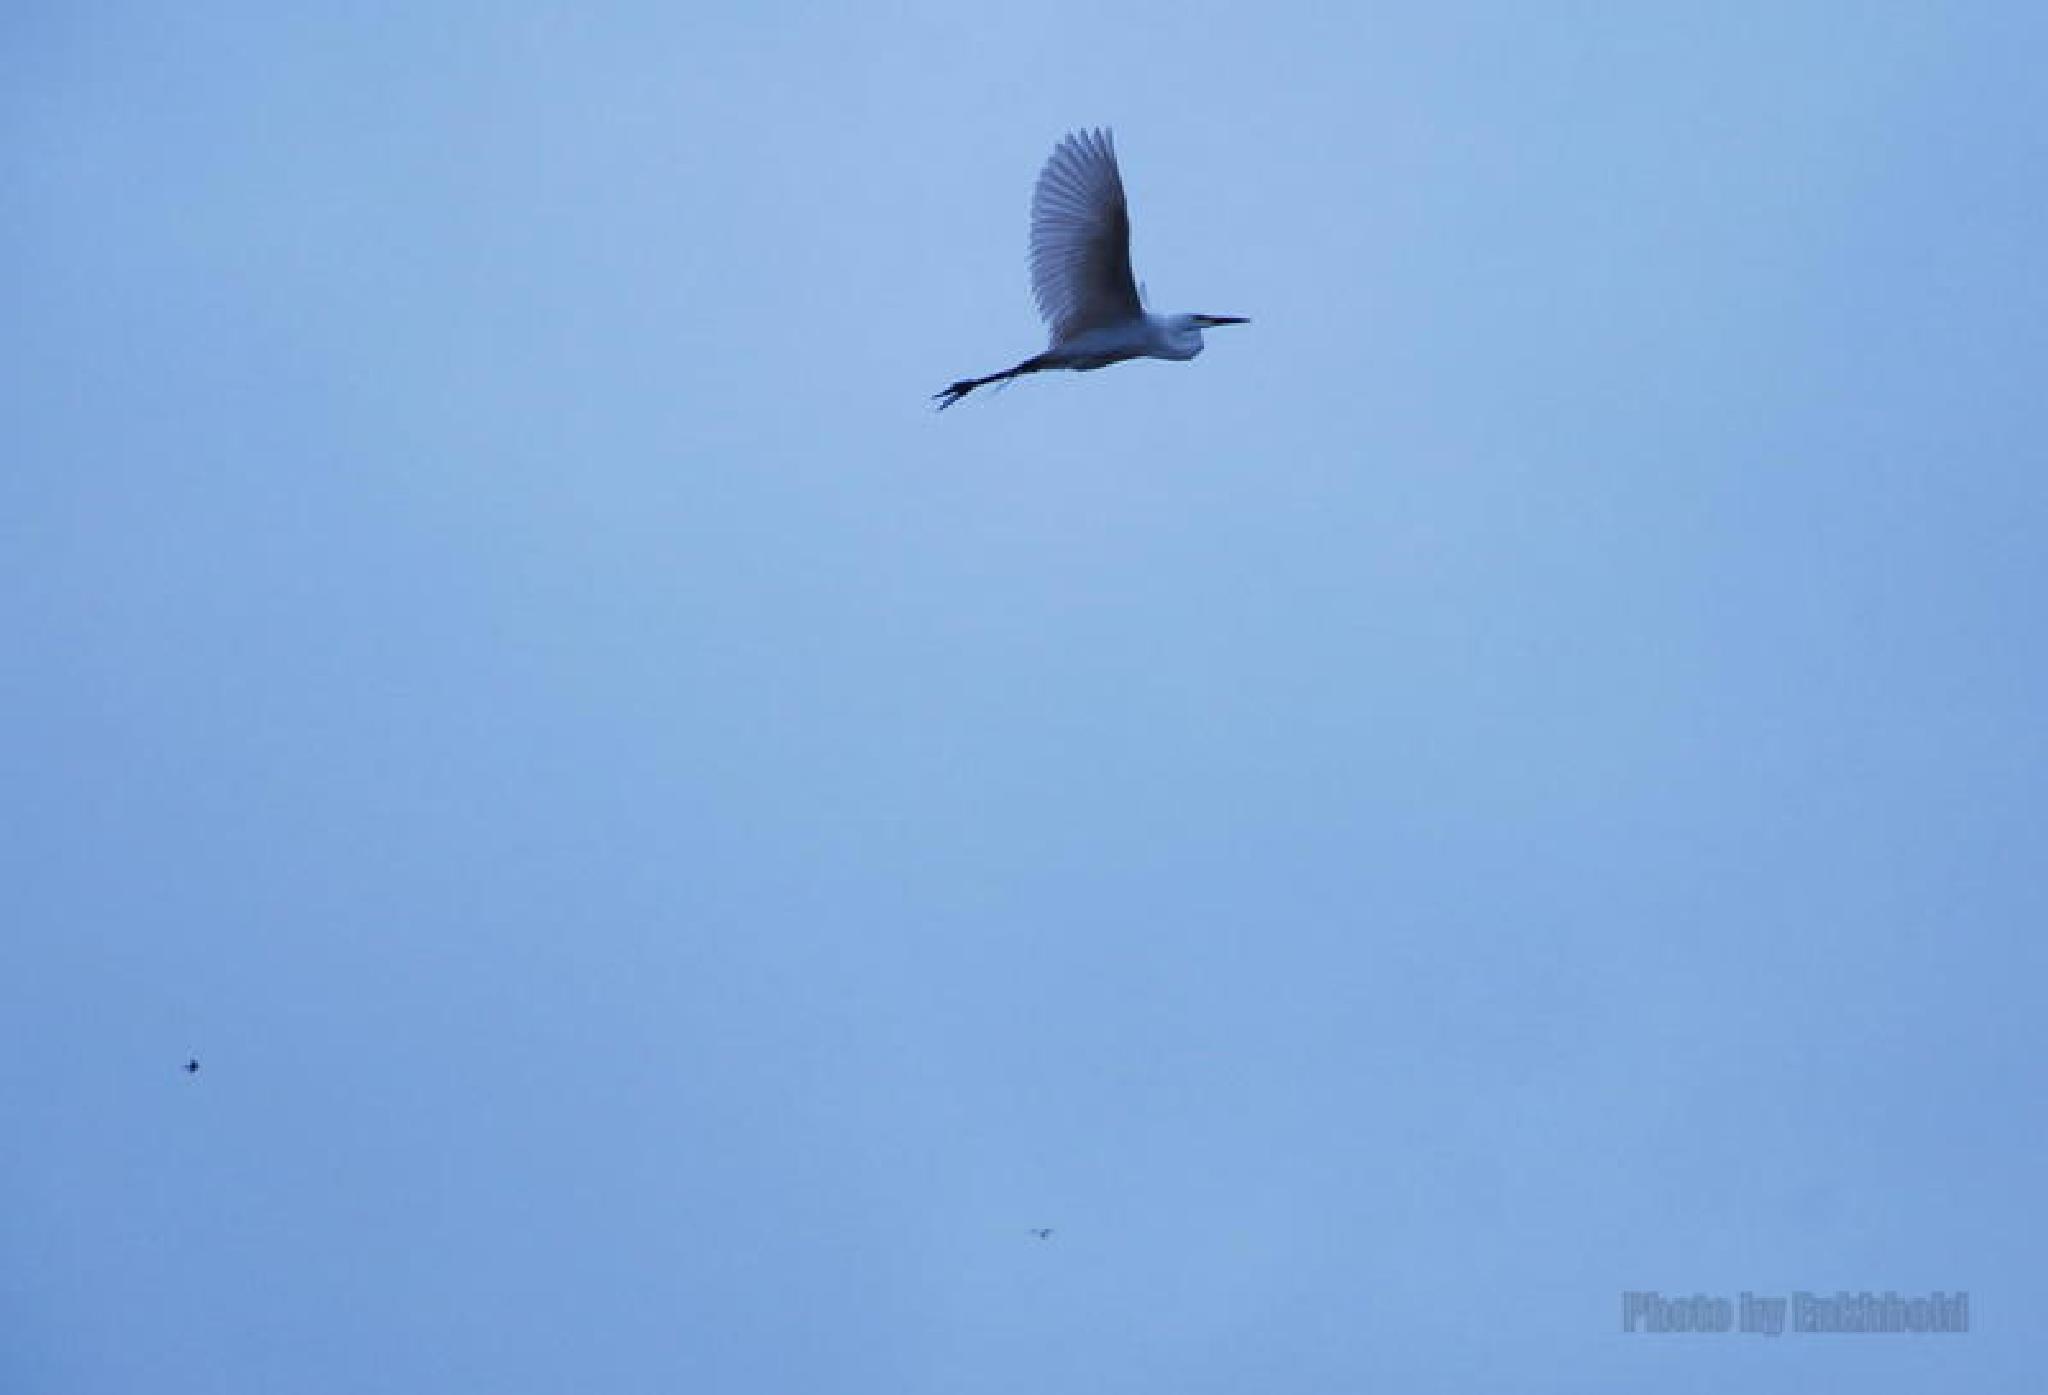 Flying by Eboseiko